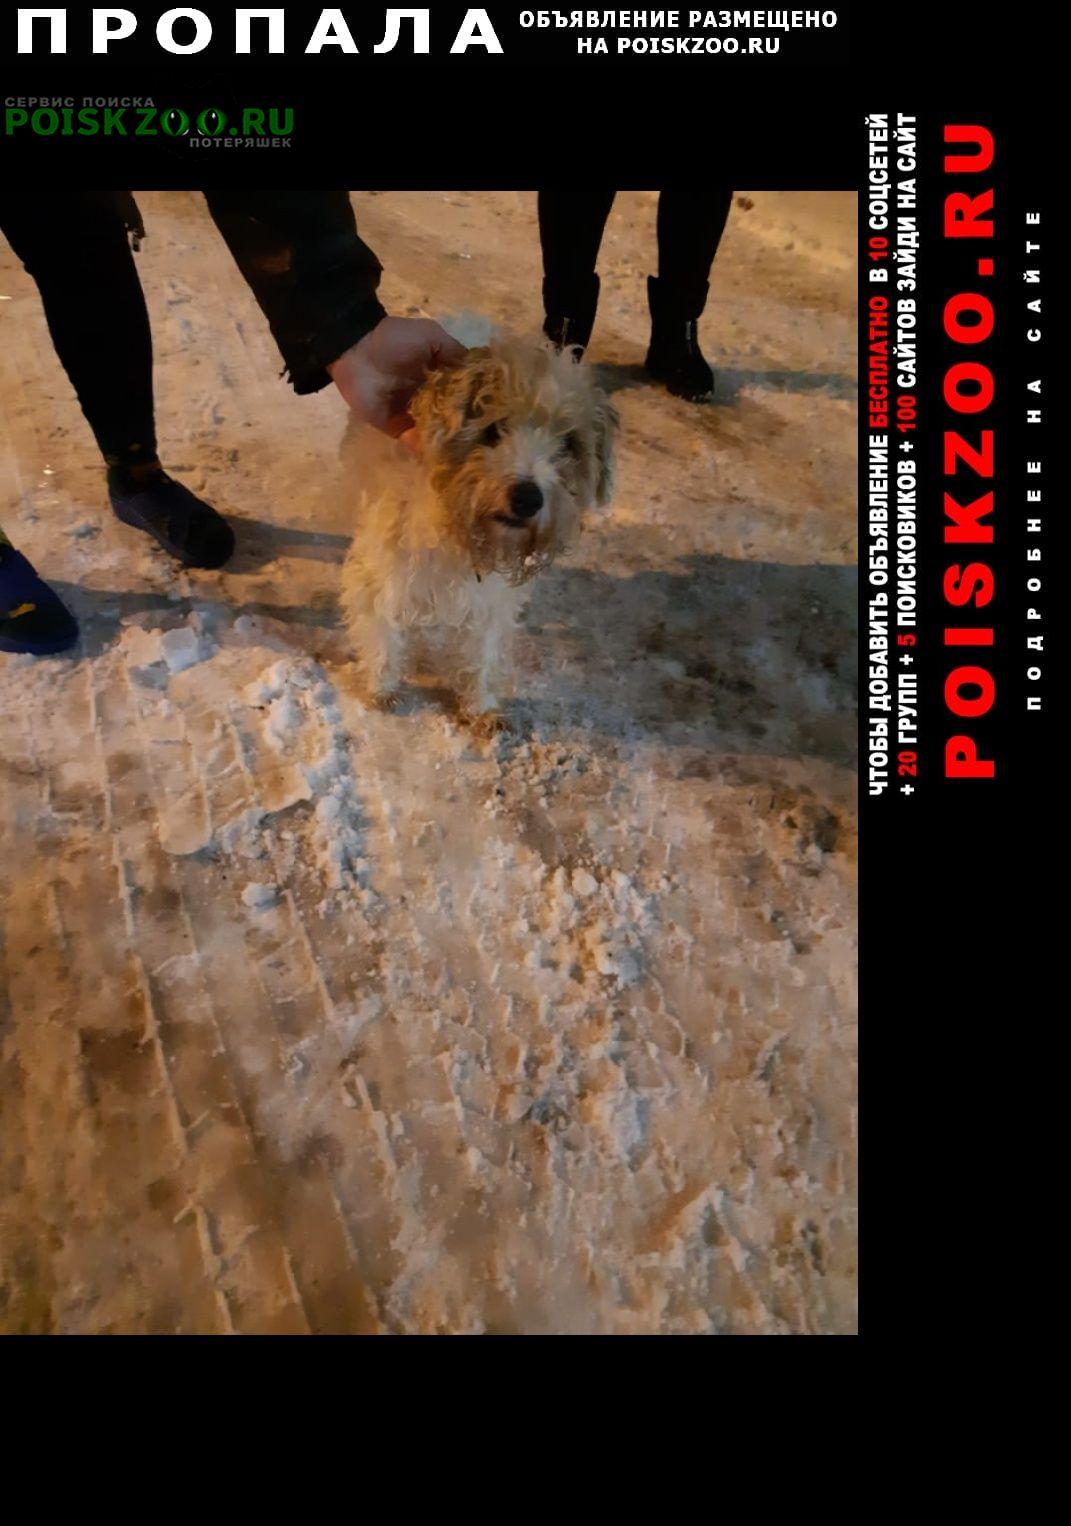 Пропала собака Мурманск